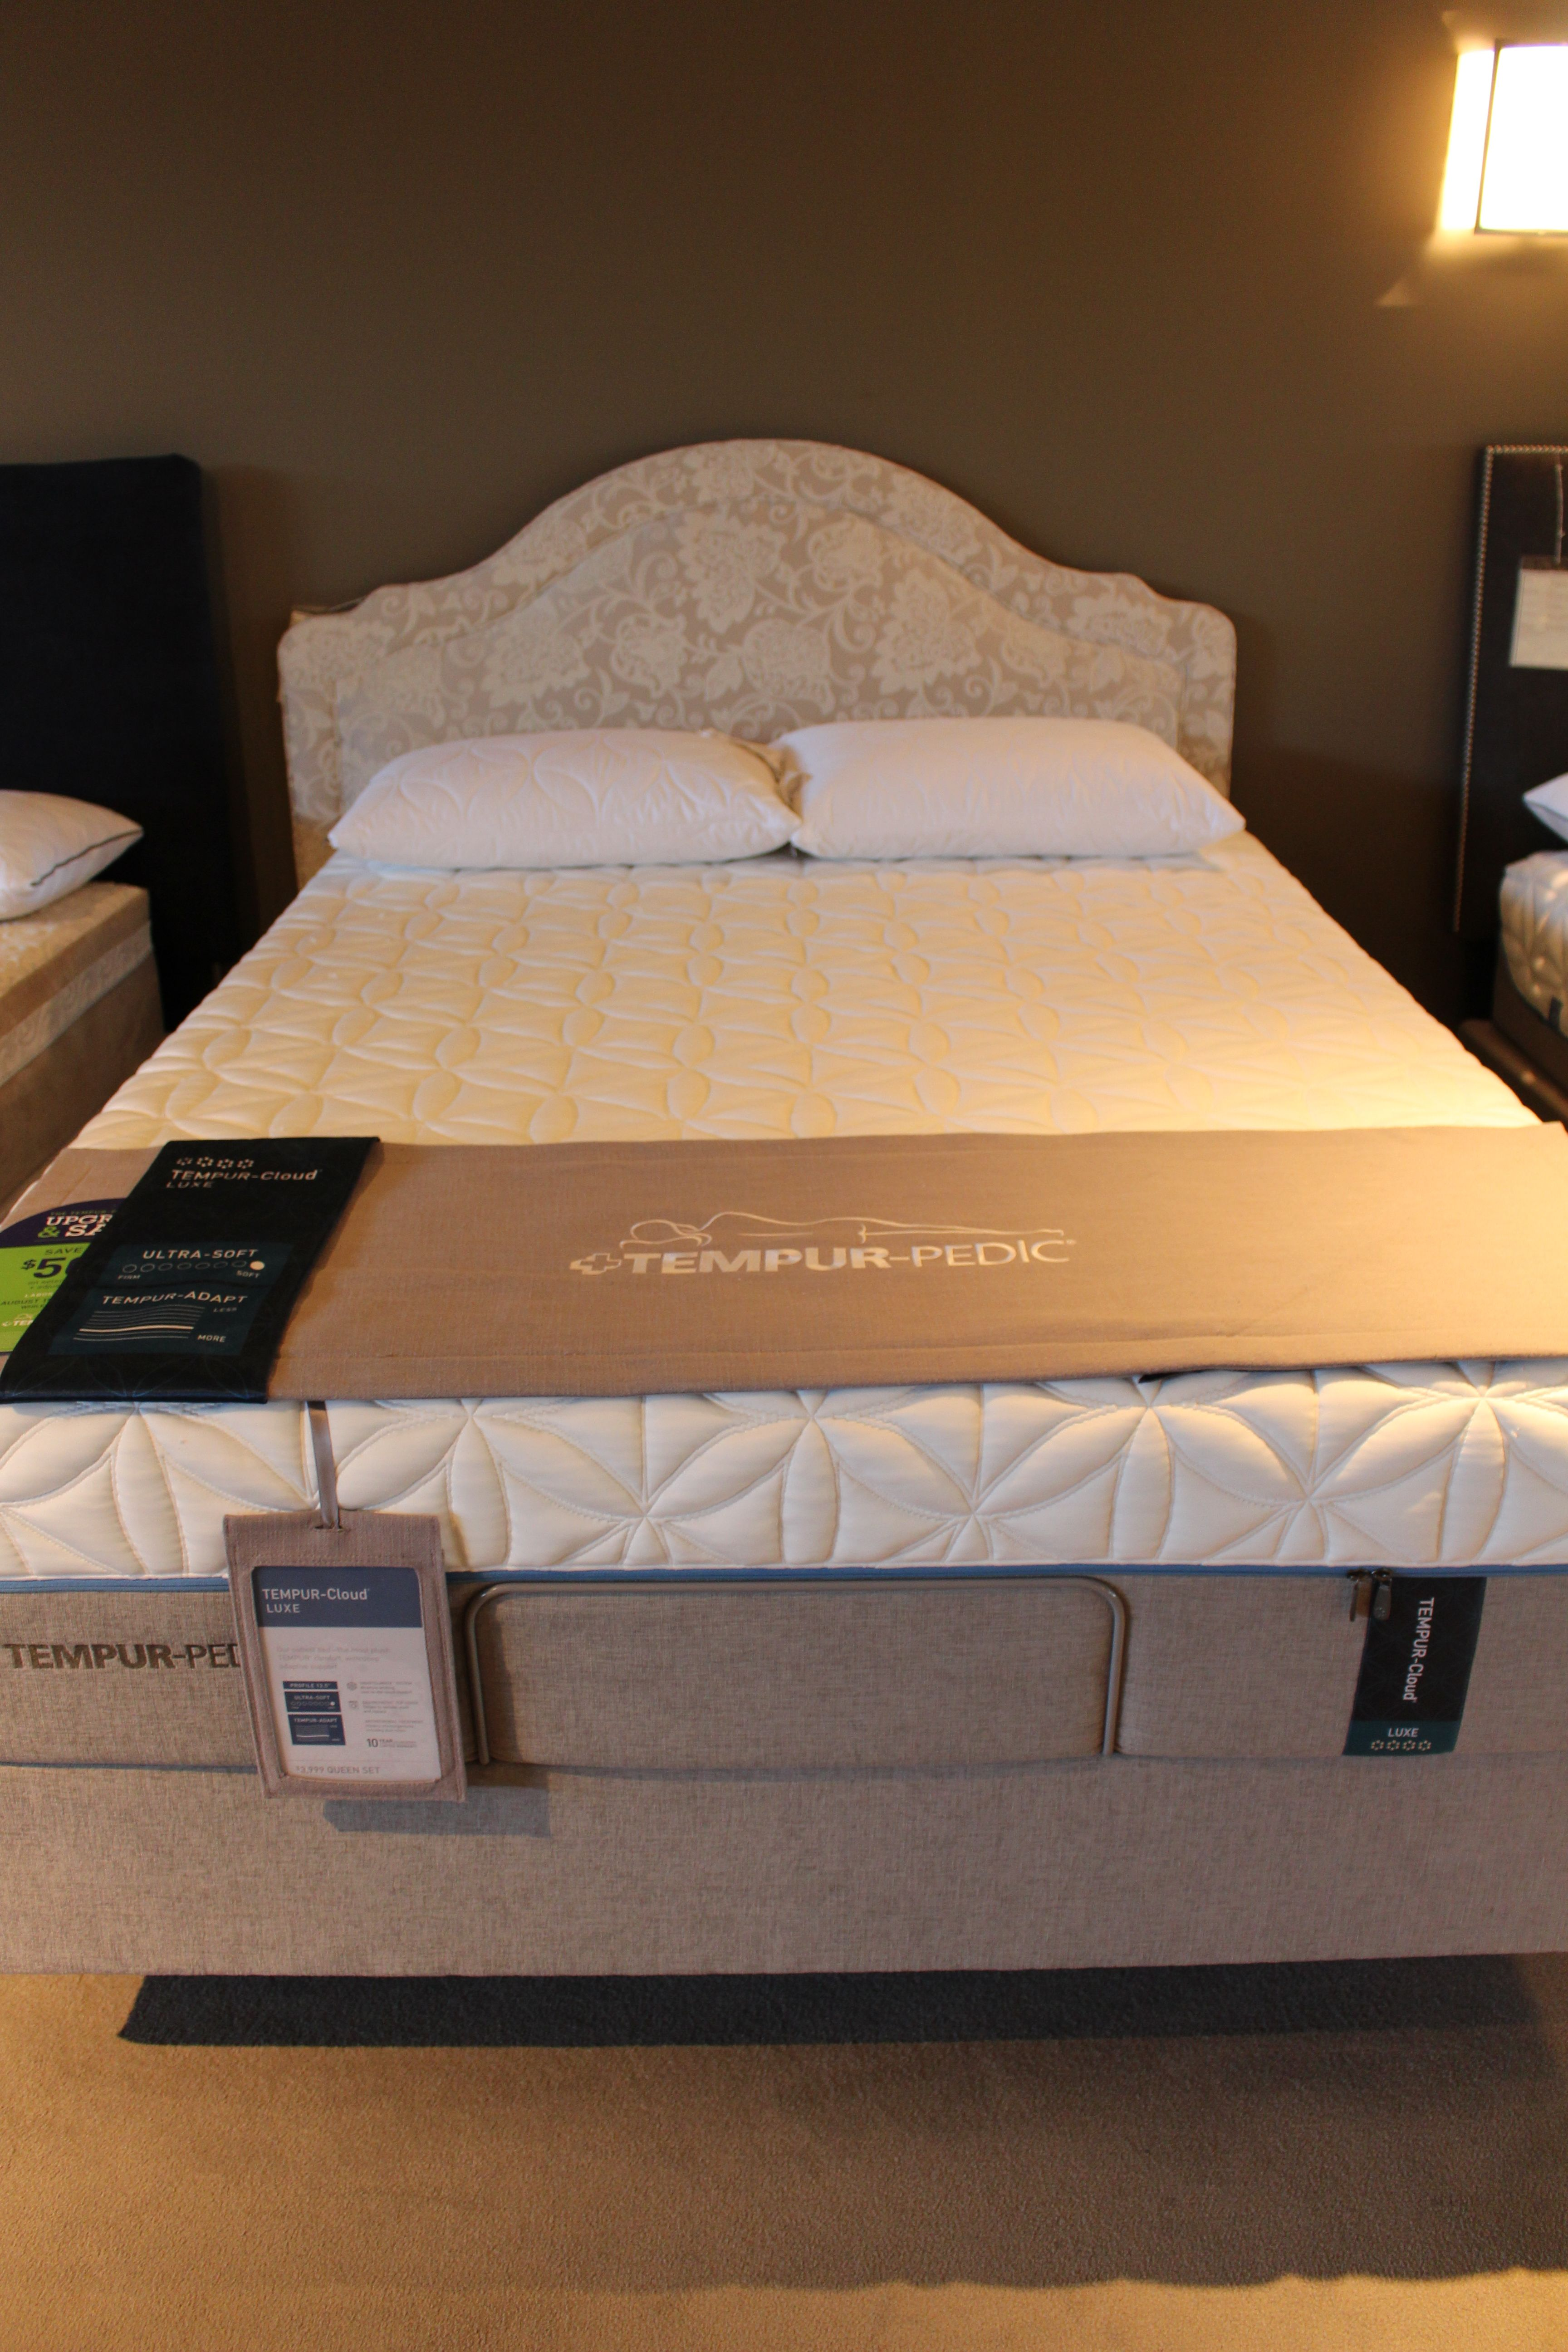 #Cardis #Furniture #CardisFurniture #Mattress #Bed #Beautyrest #sleep  #comfort